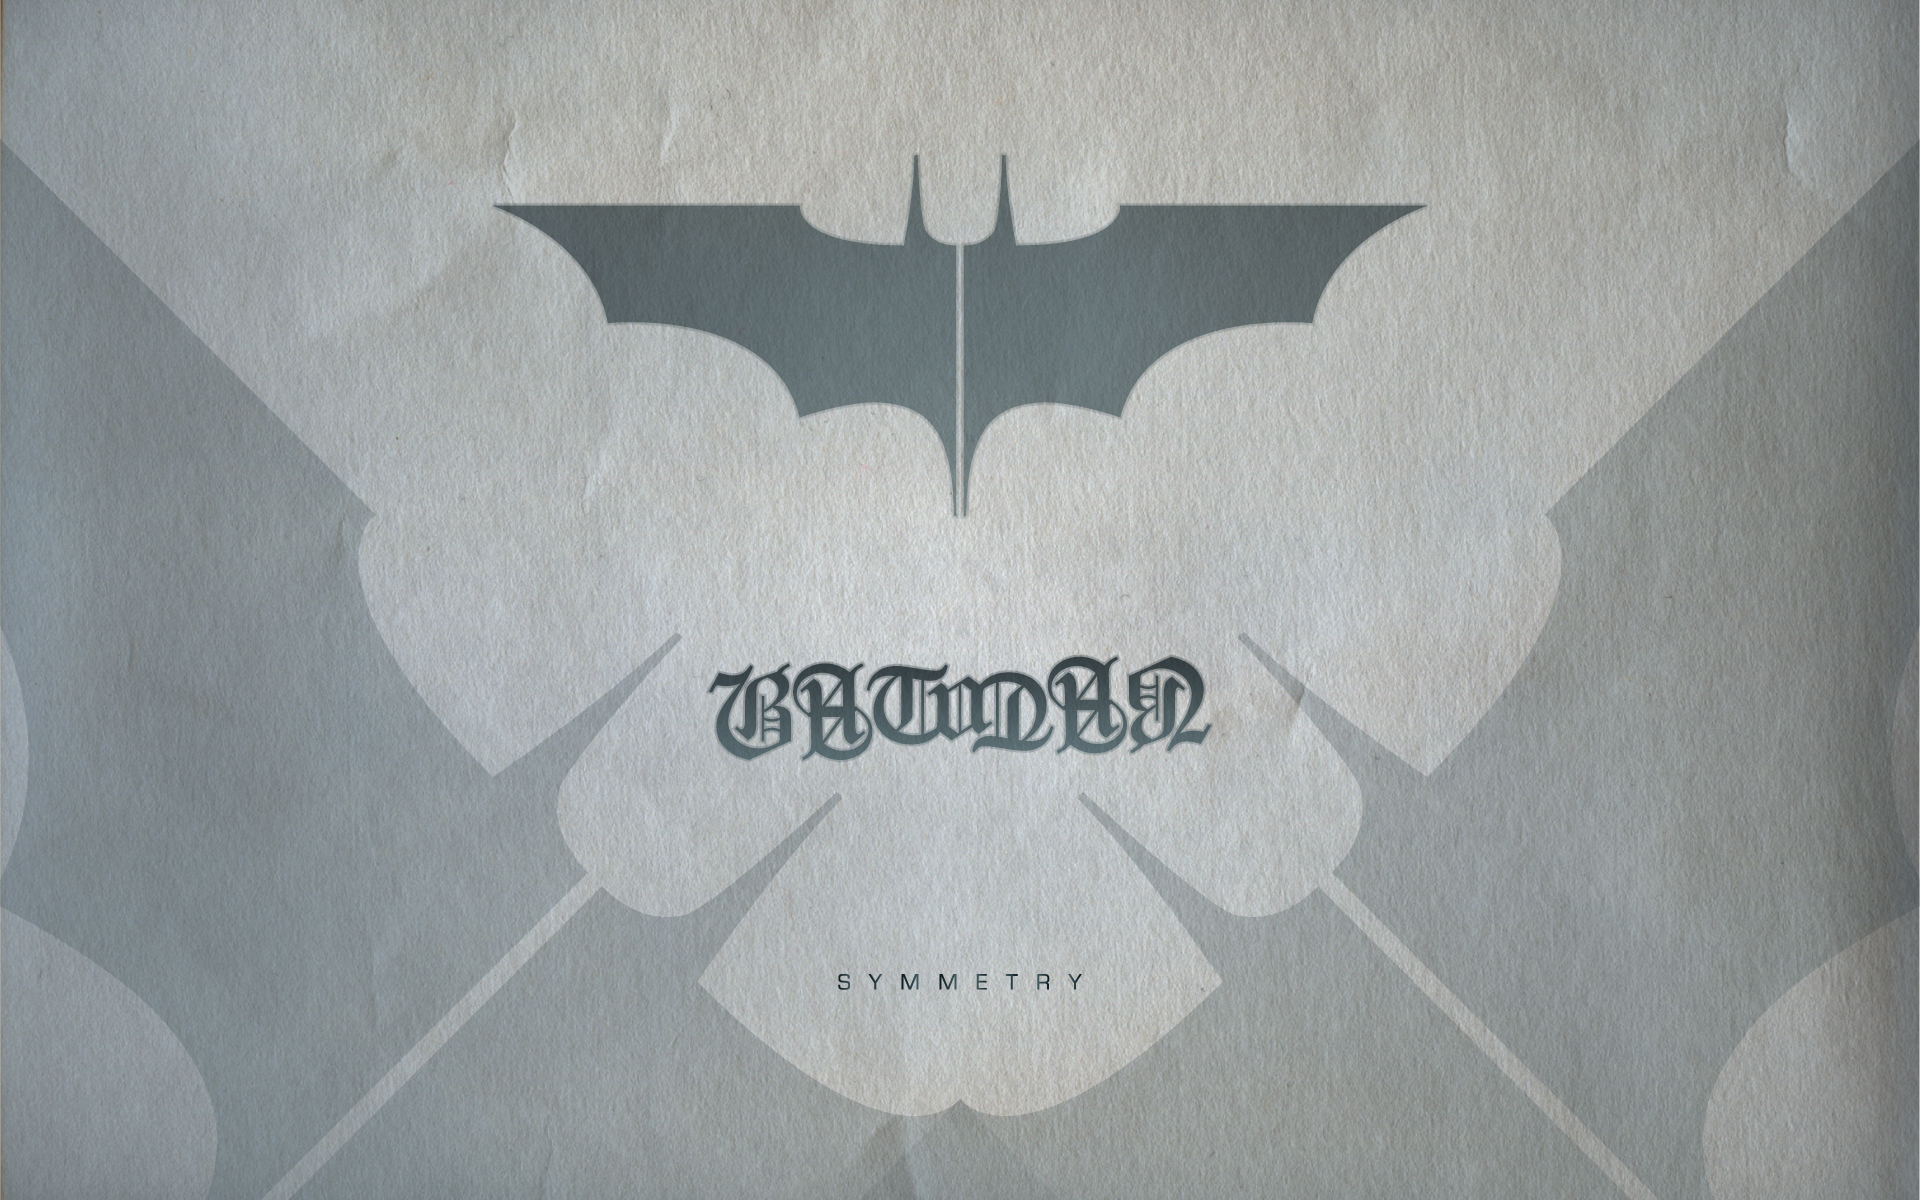 Batman Ambigram Wallpaper by michealoduibhir 1920x1200